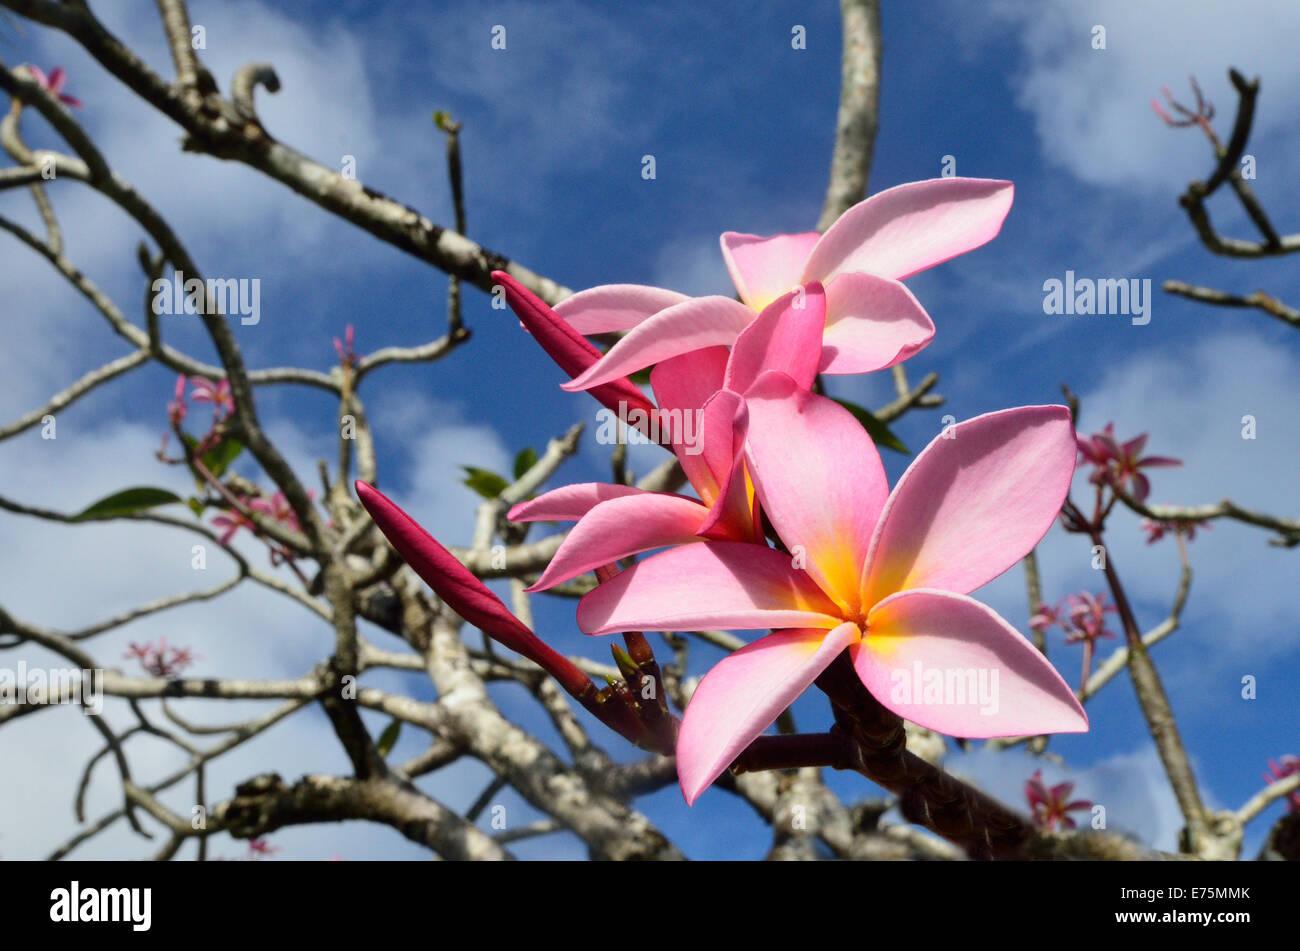 Hawaiian lei stock photos hawaiian lei stock images alamy frangipani plumeria rubra hawaiian lei flower on a tree in tropical pacific island izmirmasajfo